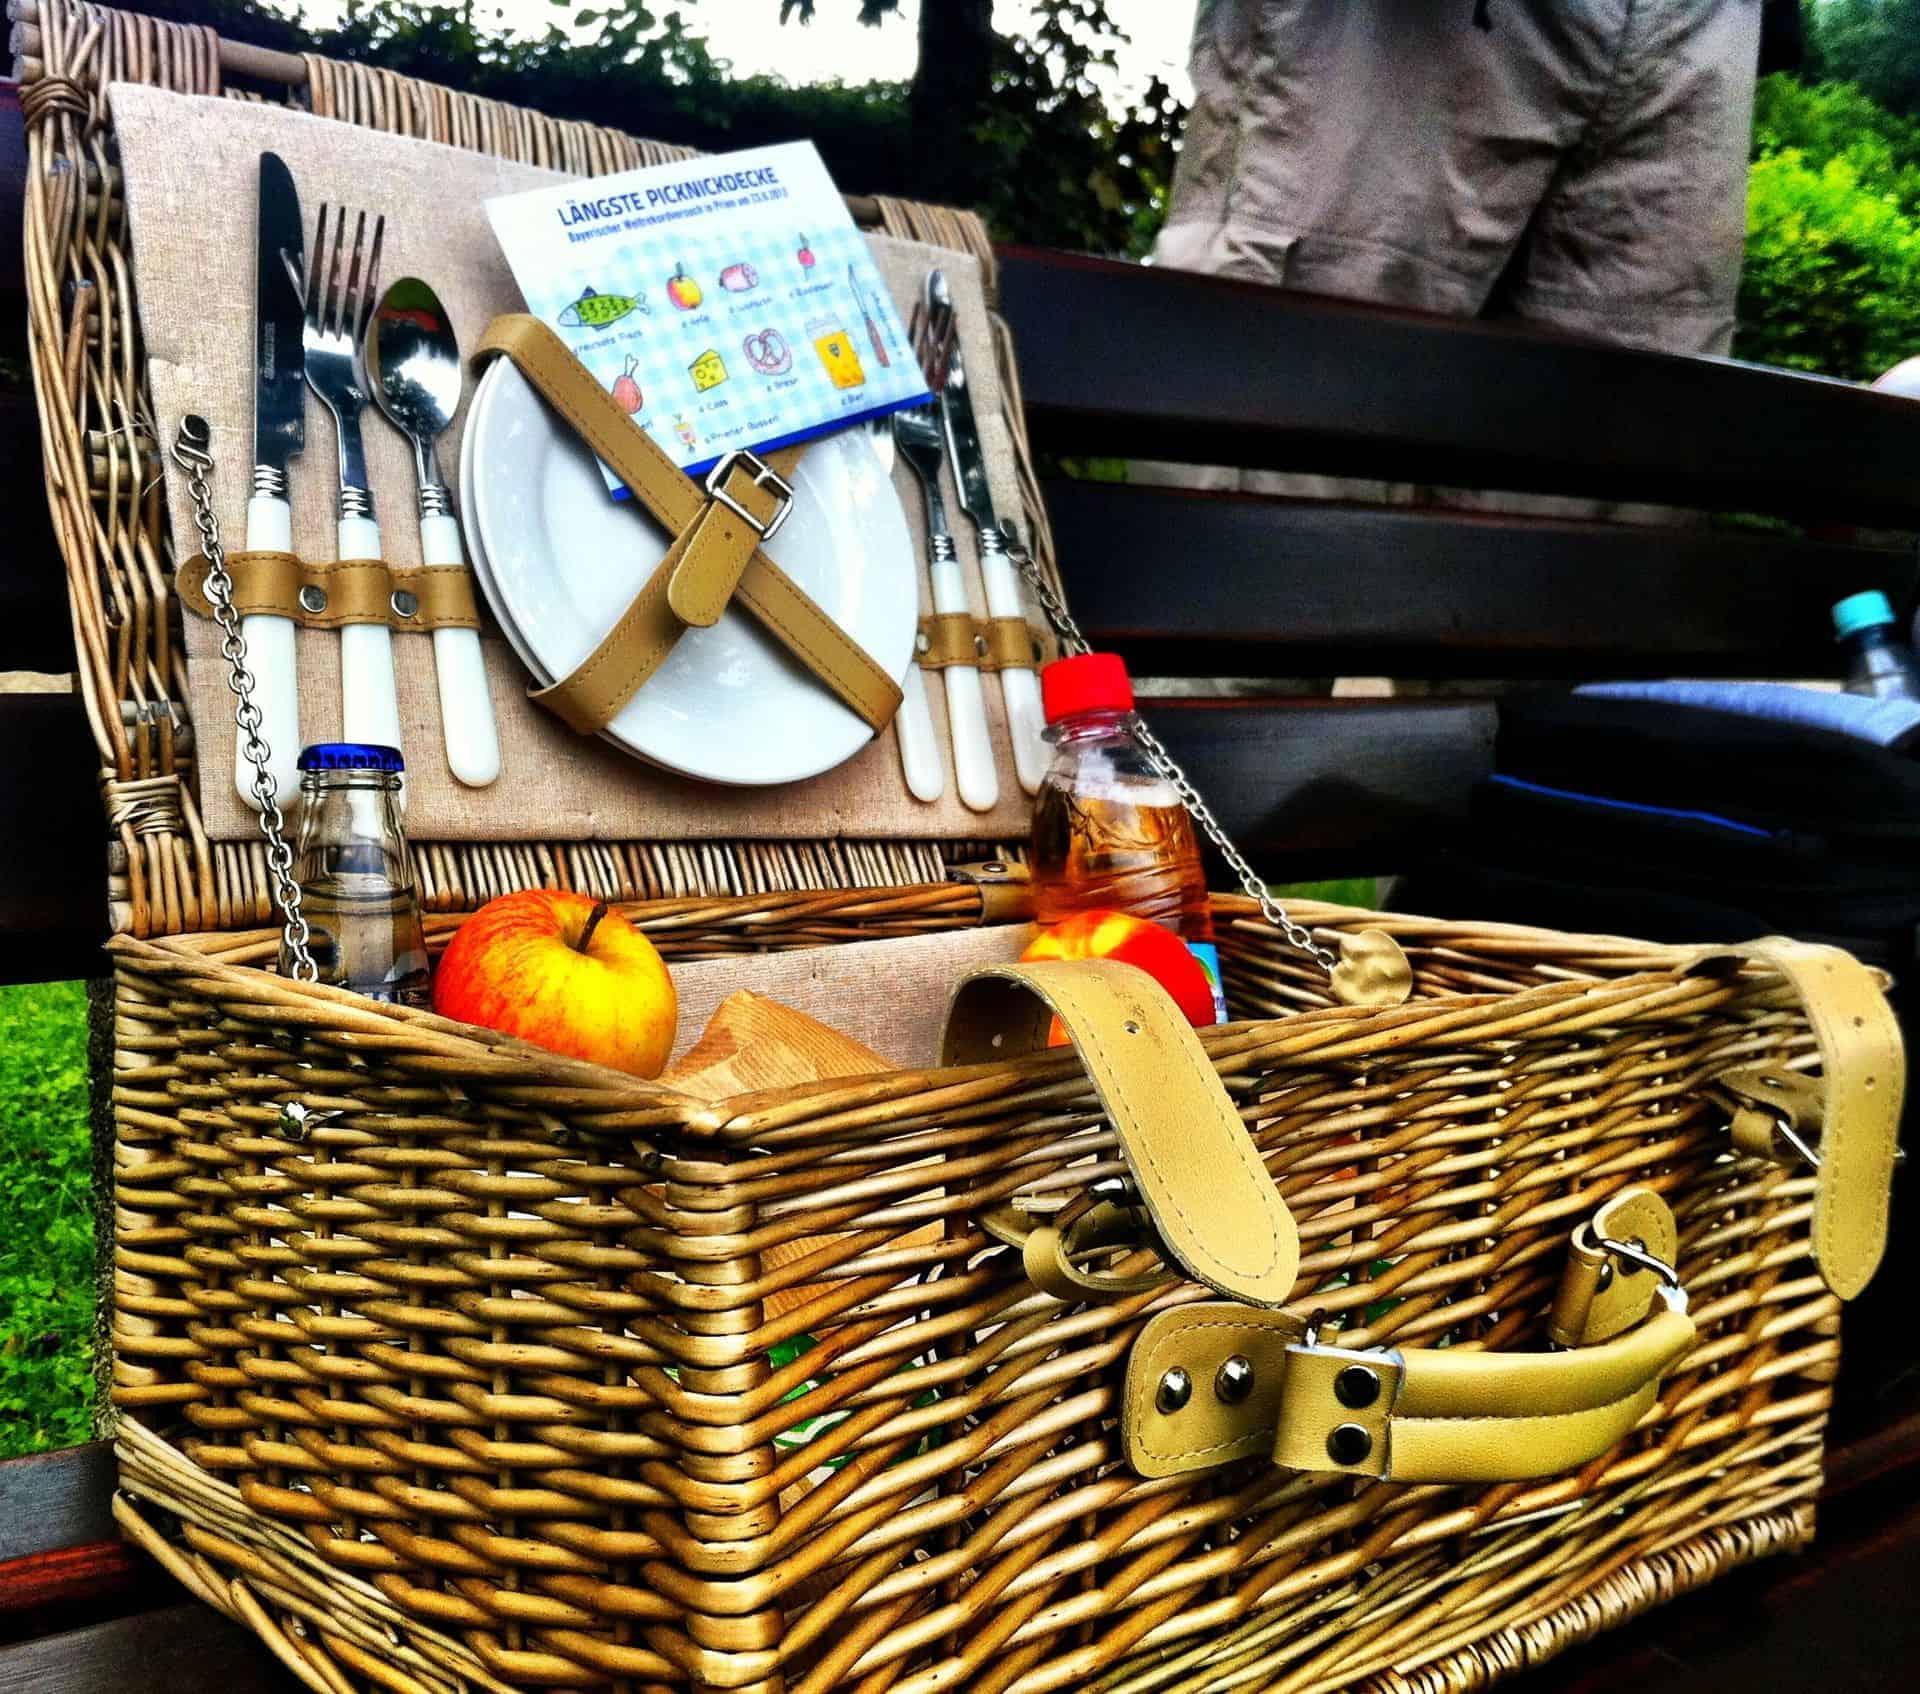 prien-am-chiemsee-picnic